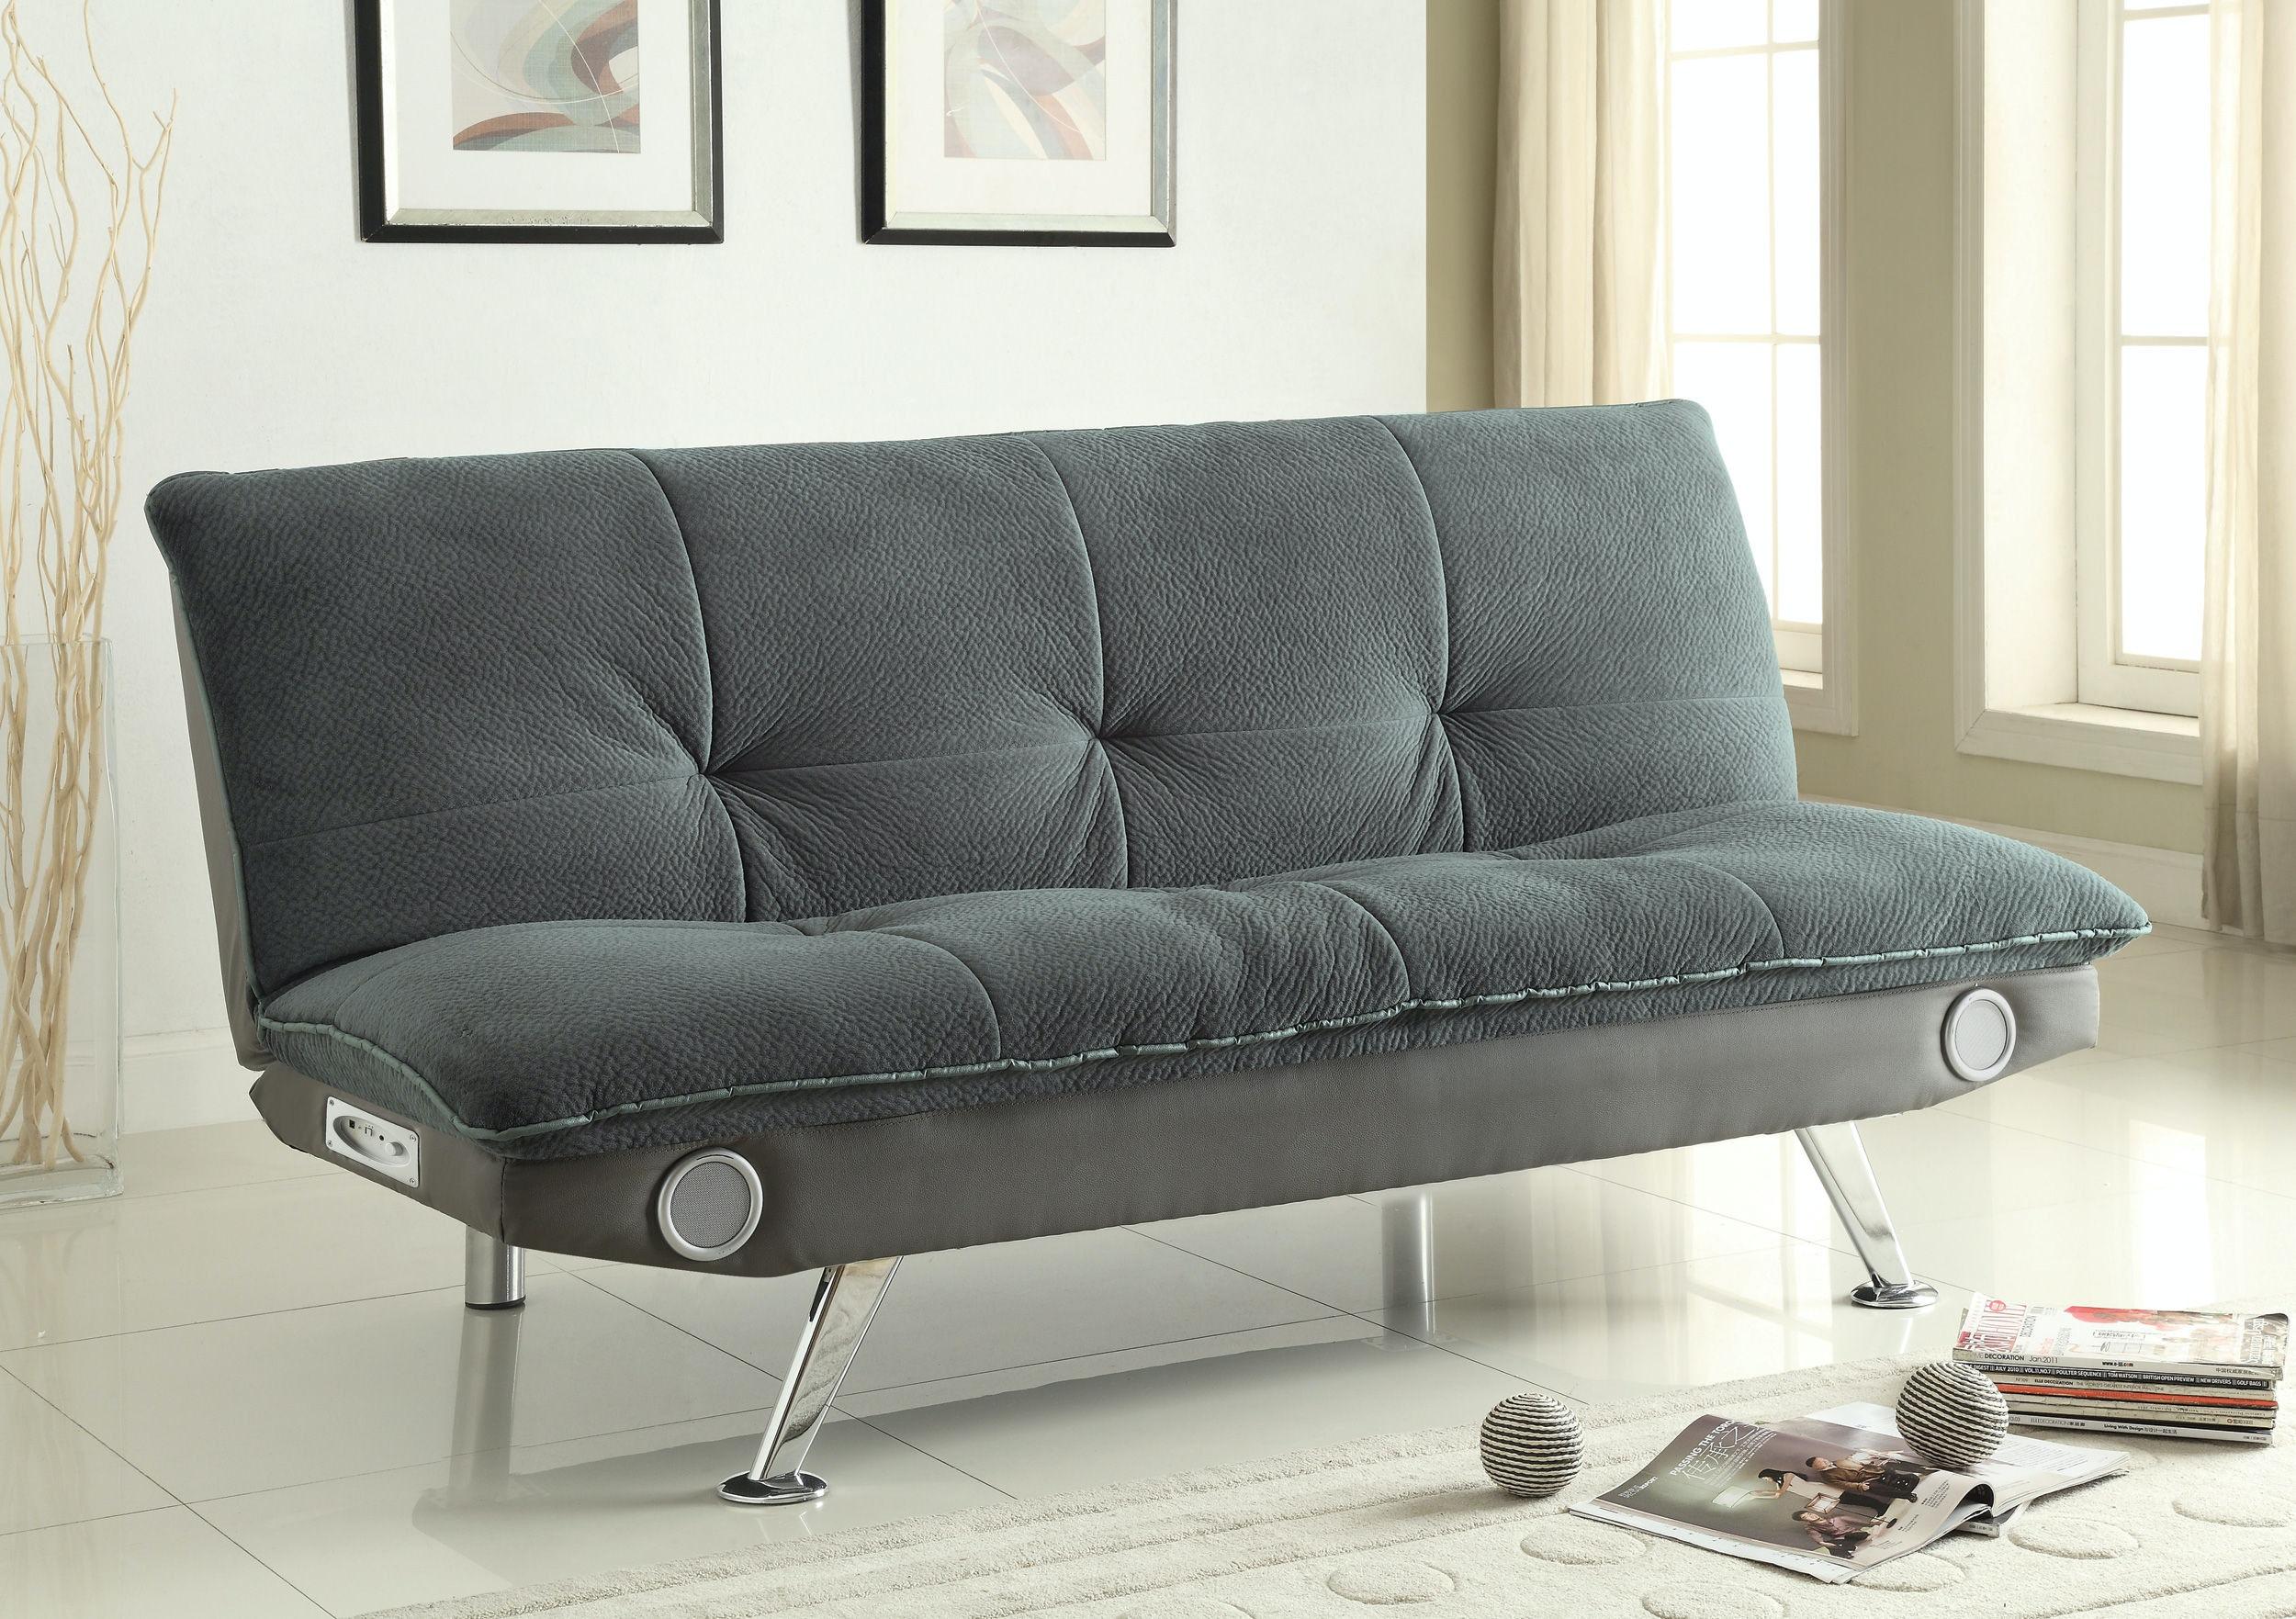 Coaster Sofa Bed 500046